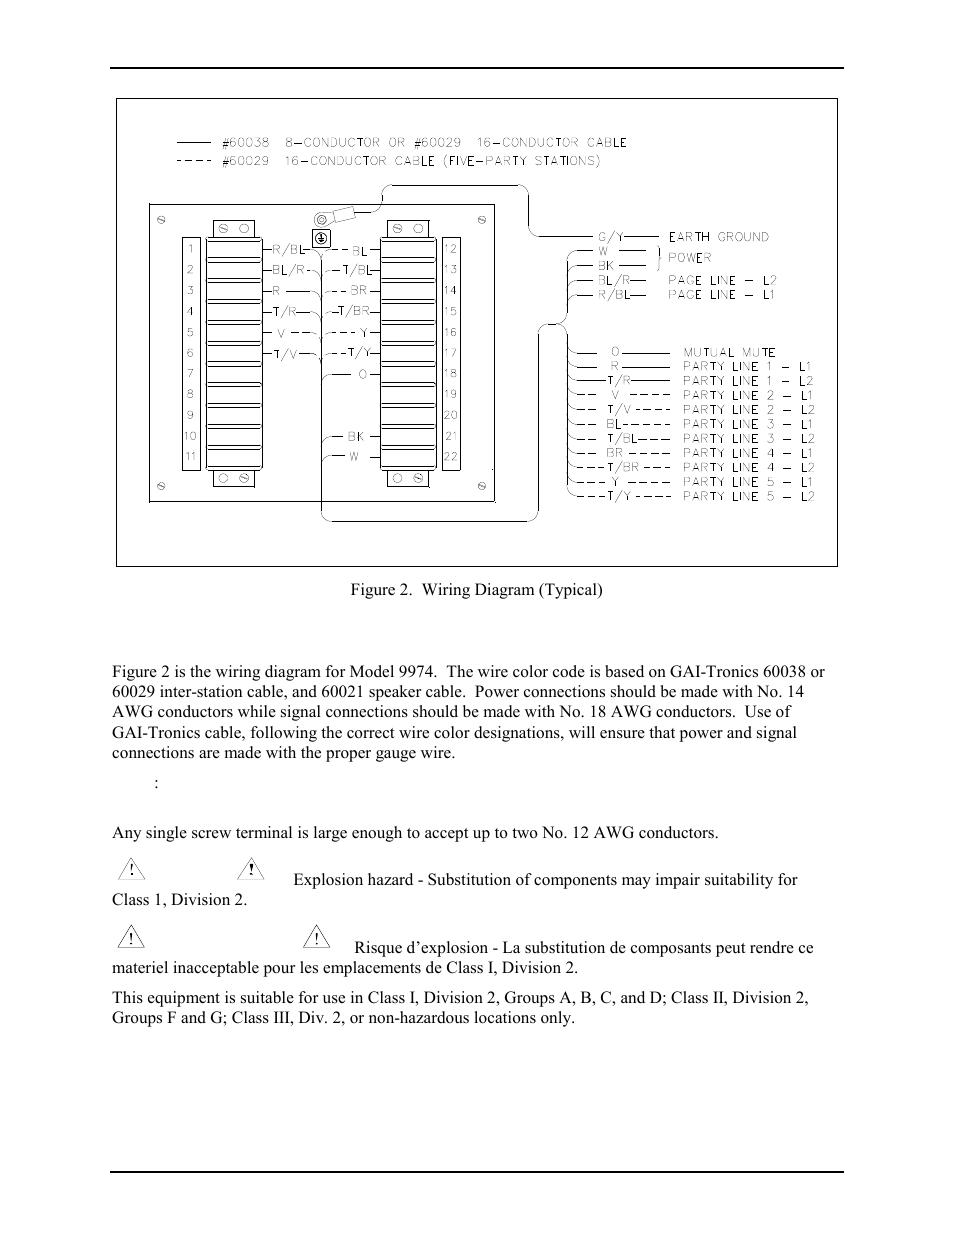 Wiring Gai Tronics 9974 Junction Box User Manual Page 3 5 John Deere Diagram 997